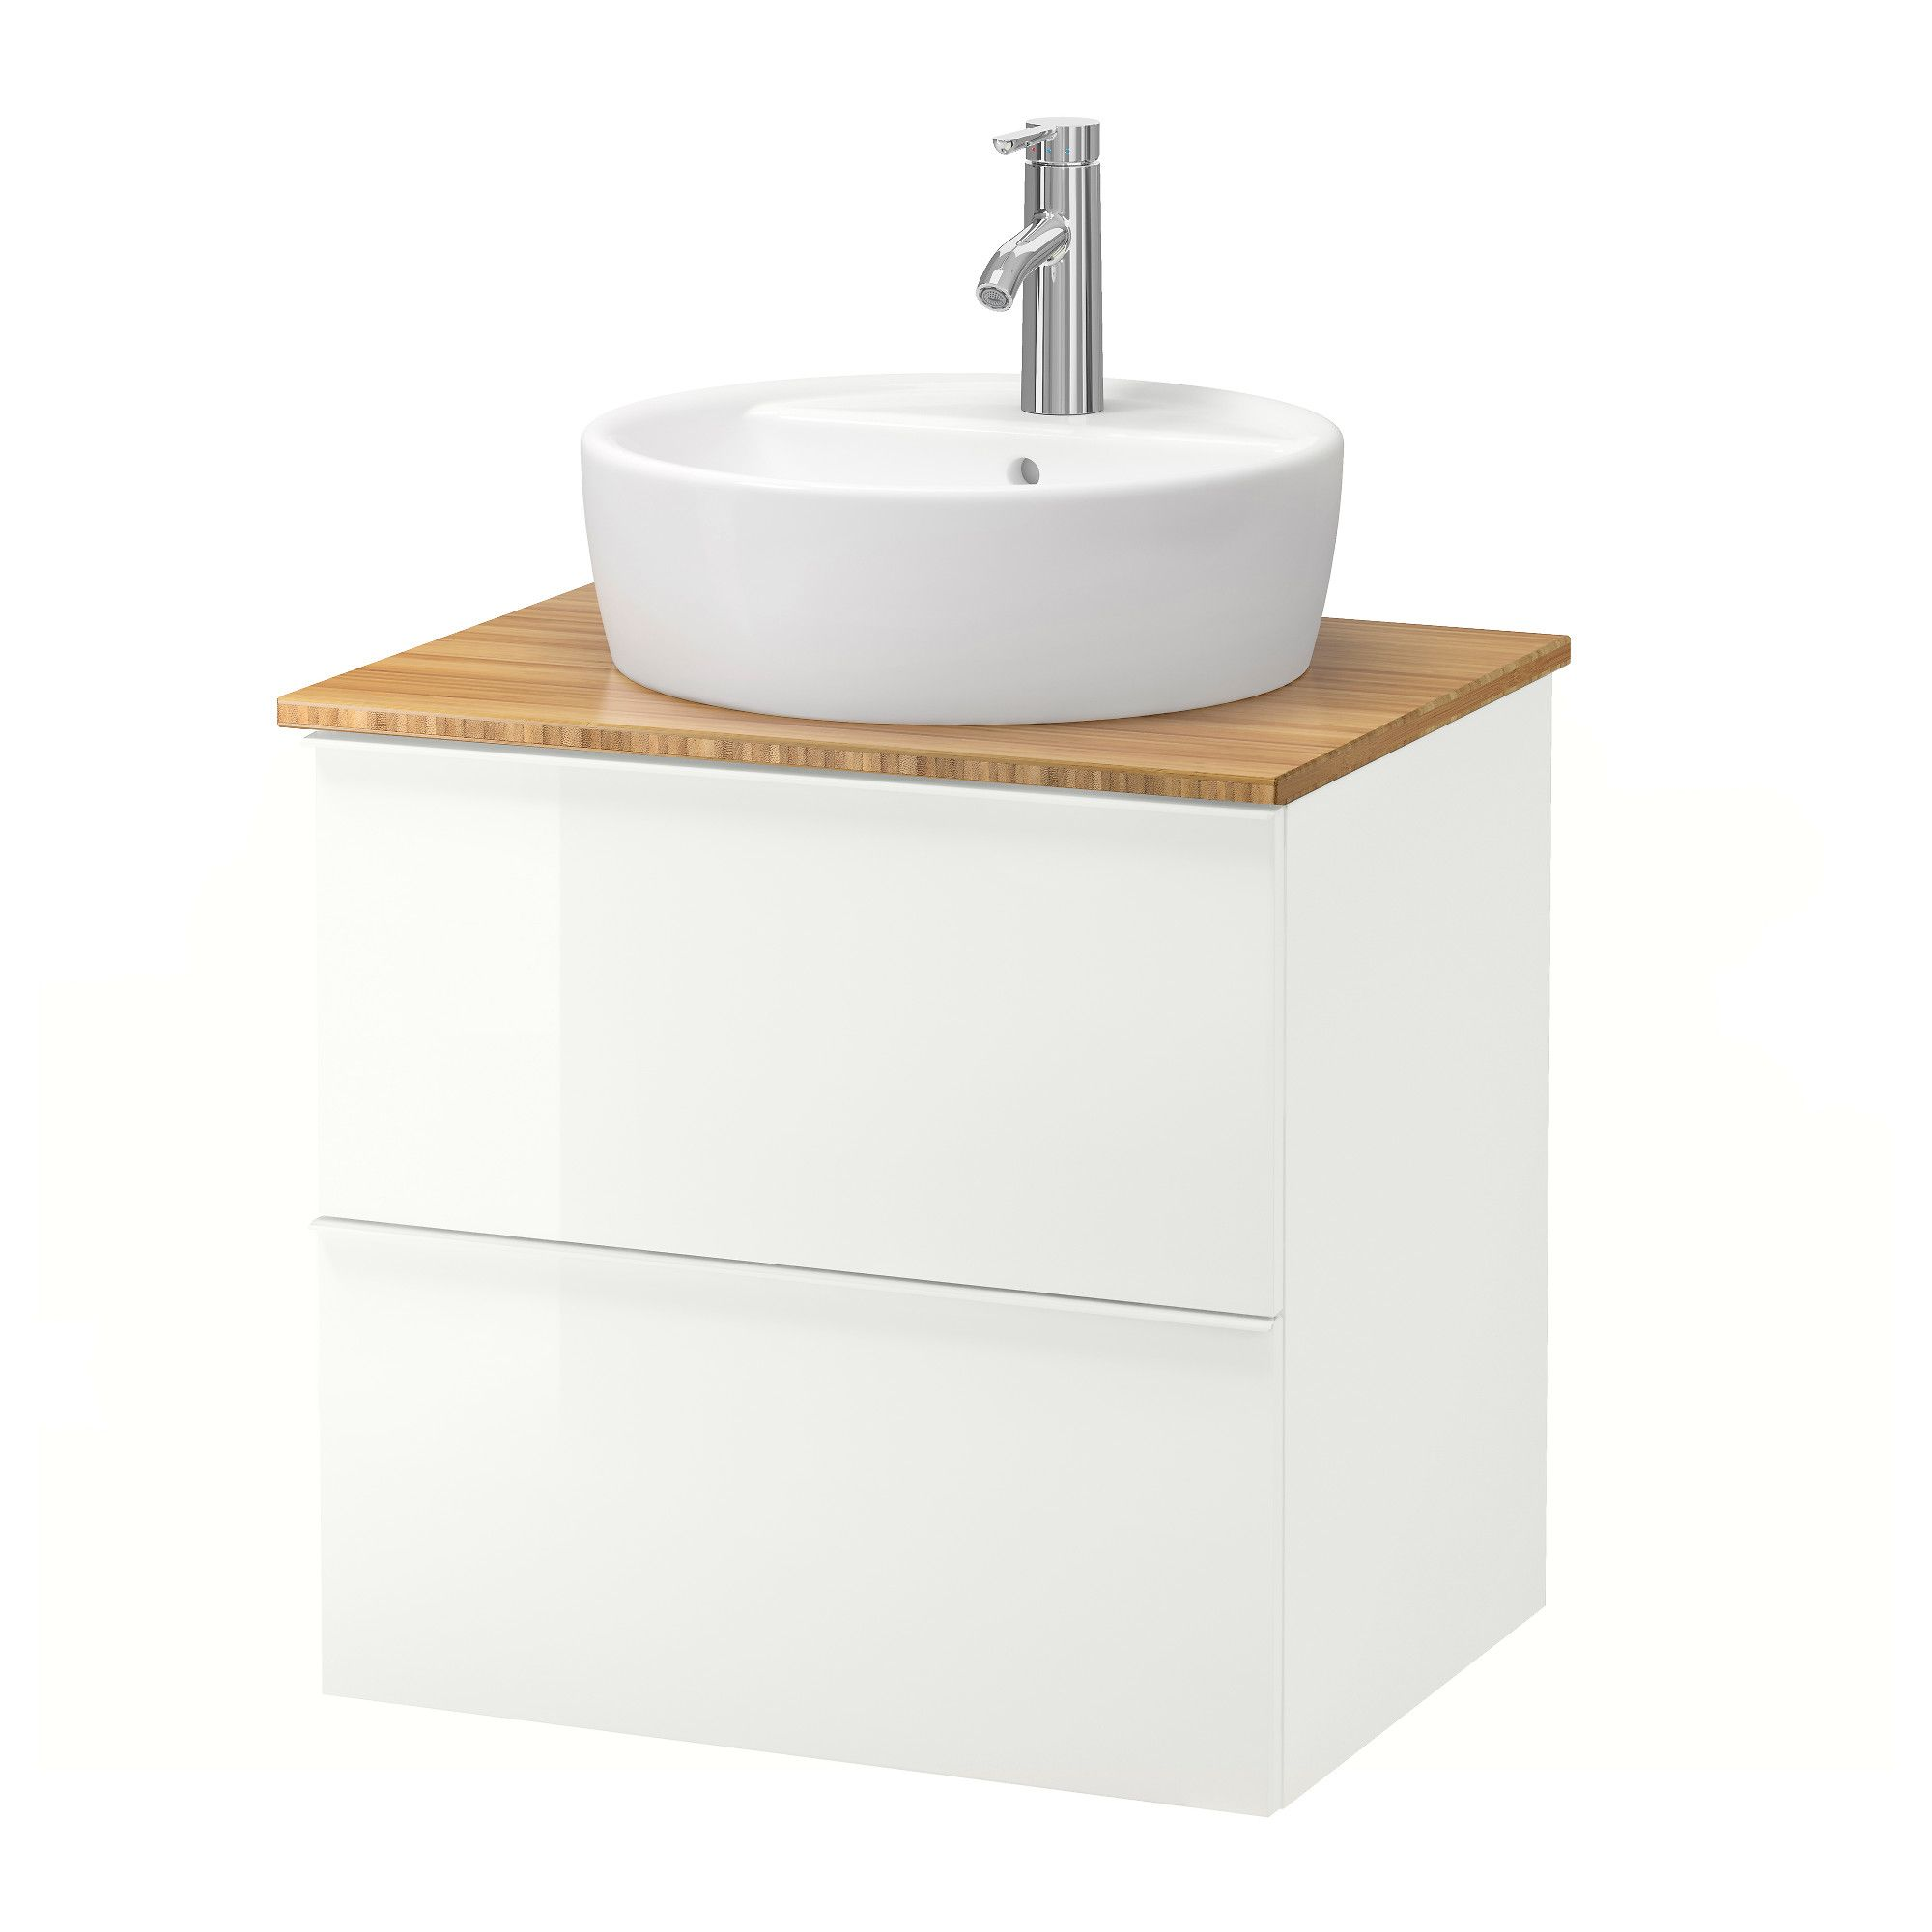 Furniture And Home Furnishings In 2019 Bathroom Sink